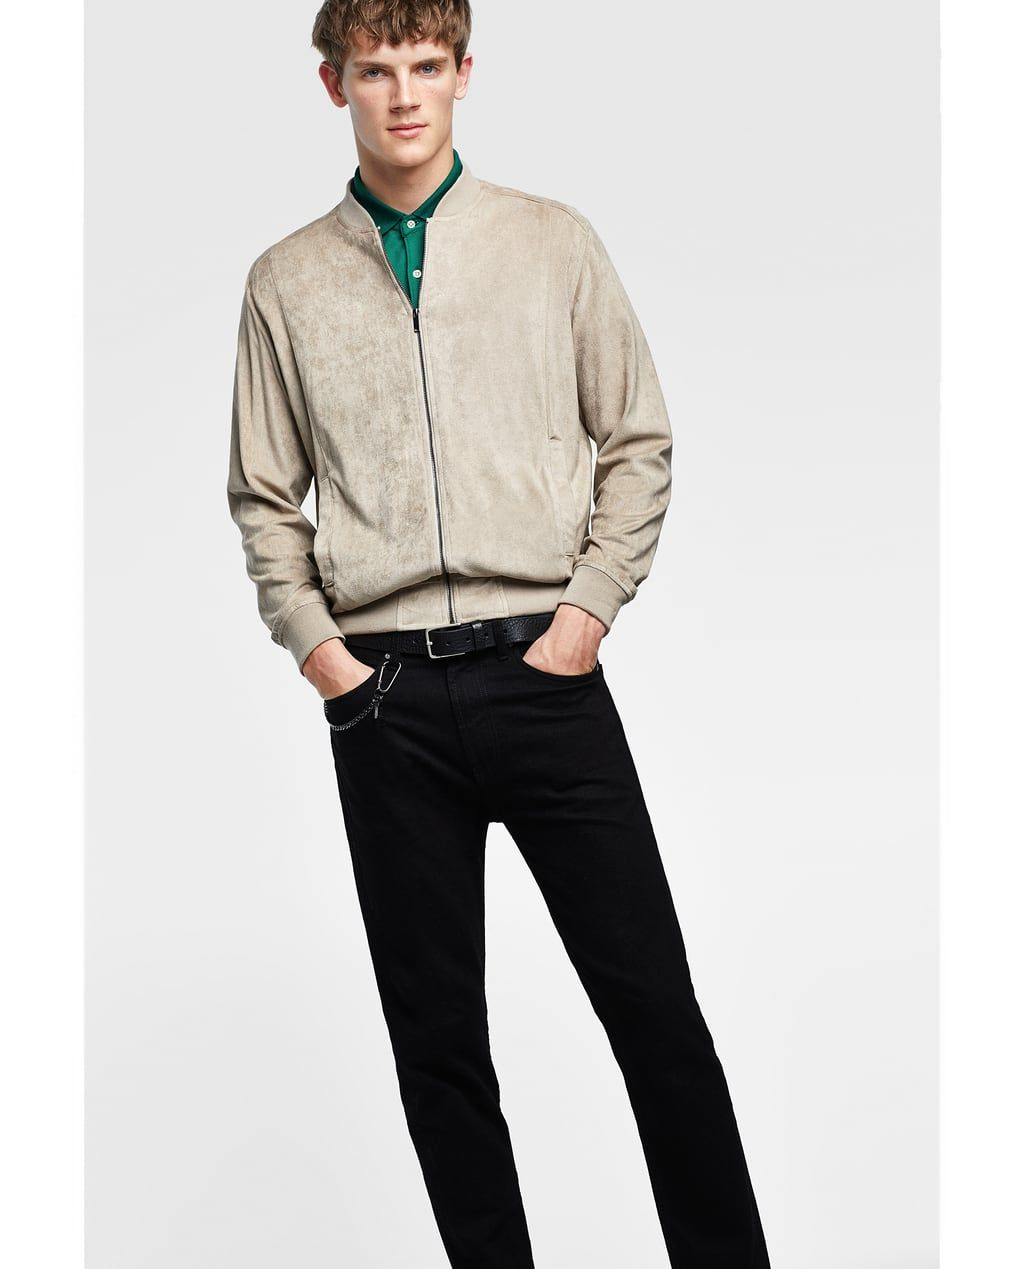 2ac9c99818 Men's Jackets | New Collection Online | ZARA United States | Eros ...